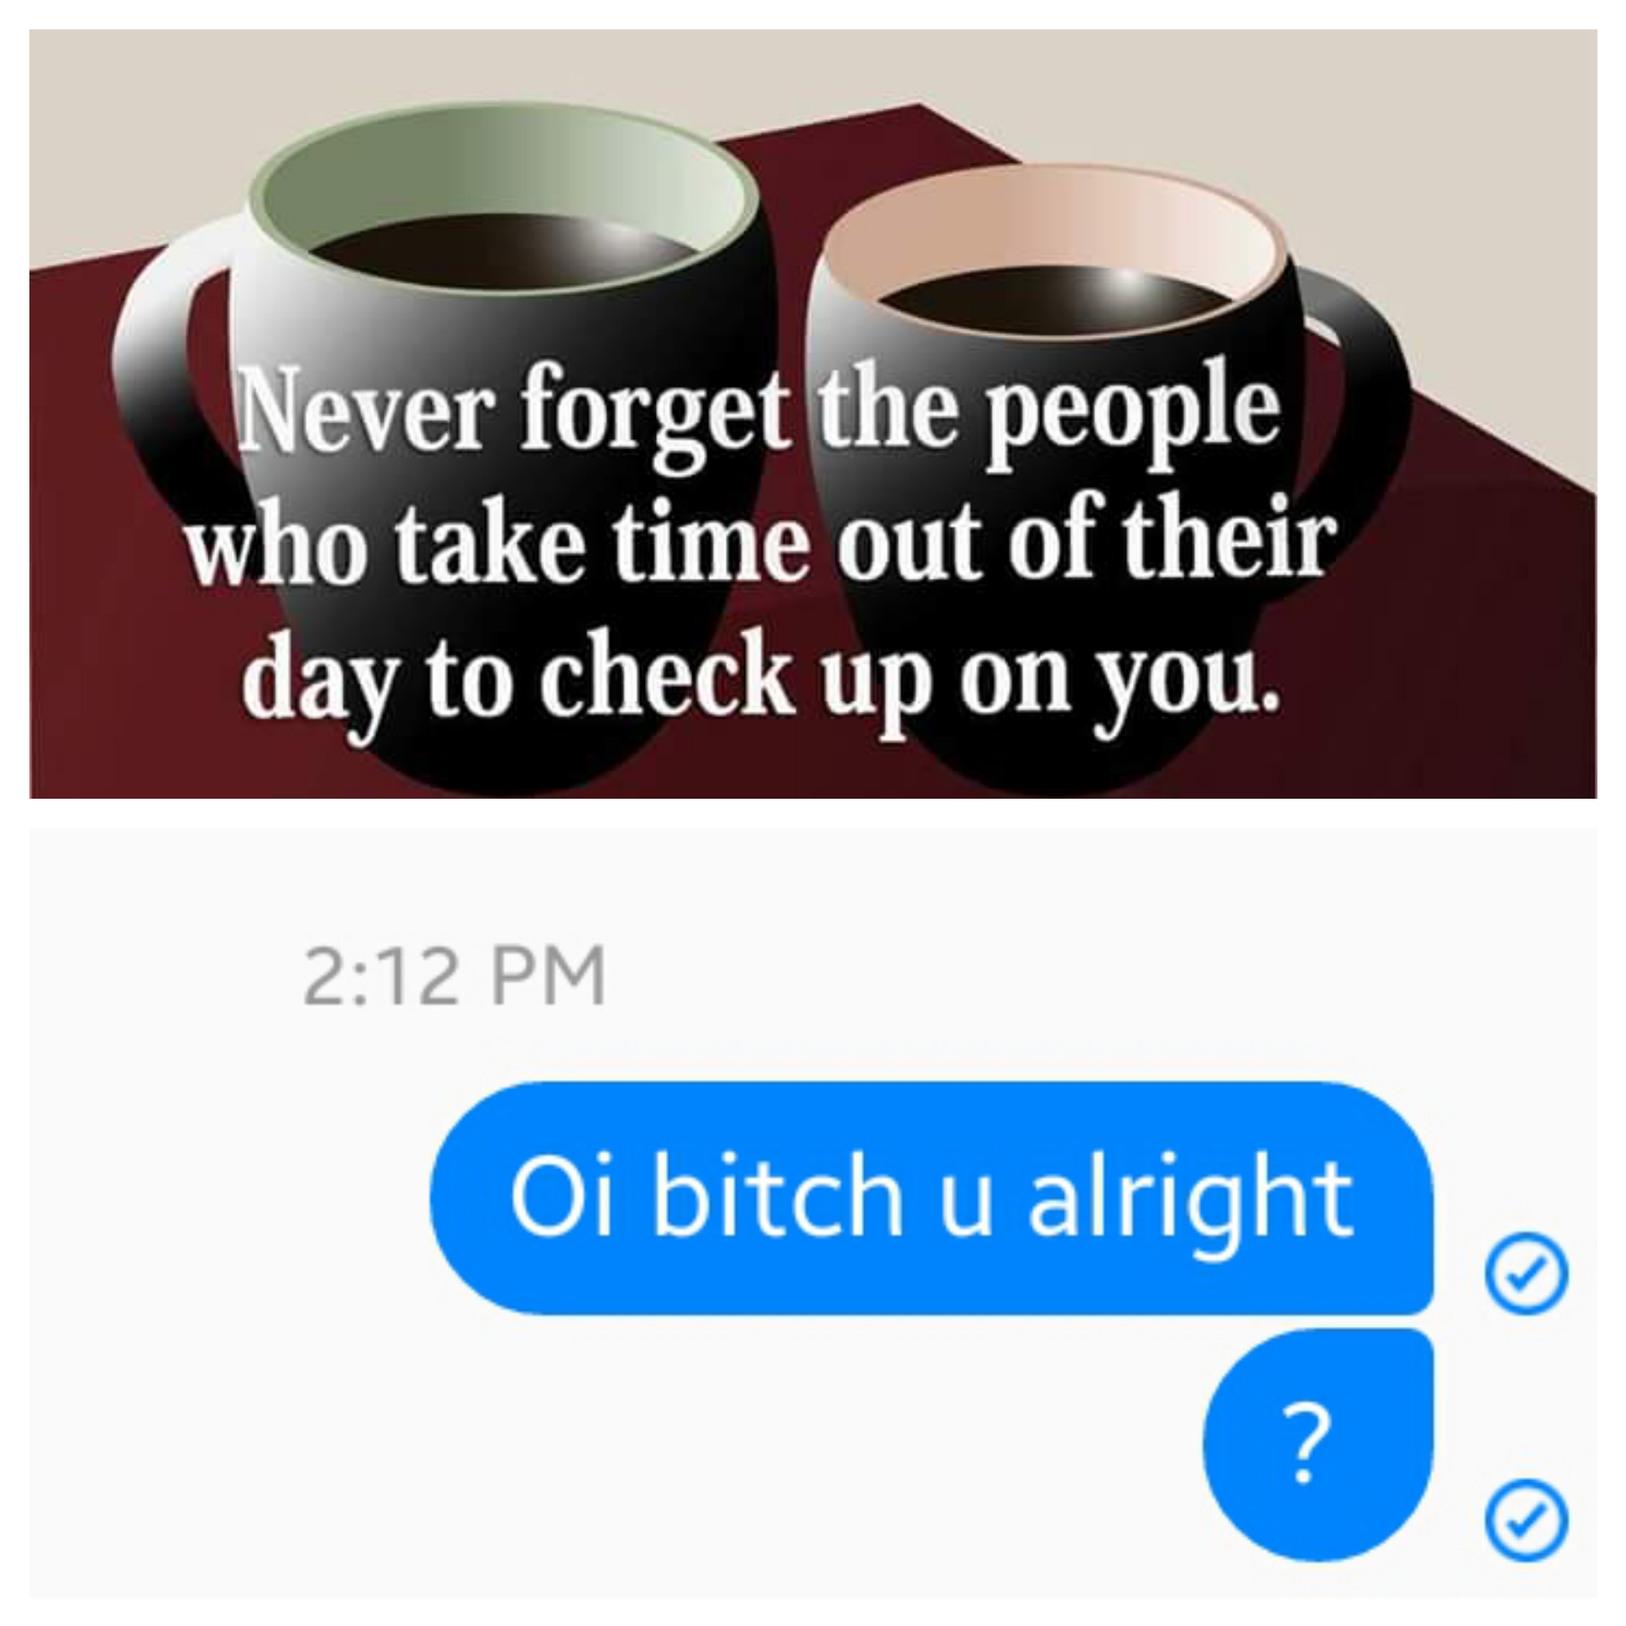 My first self-made meme